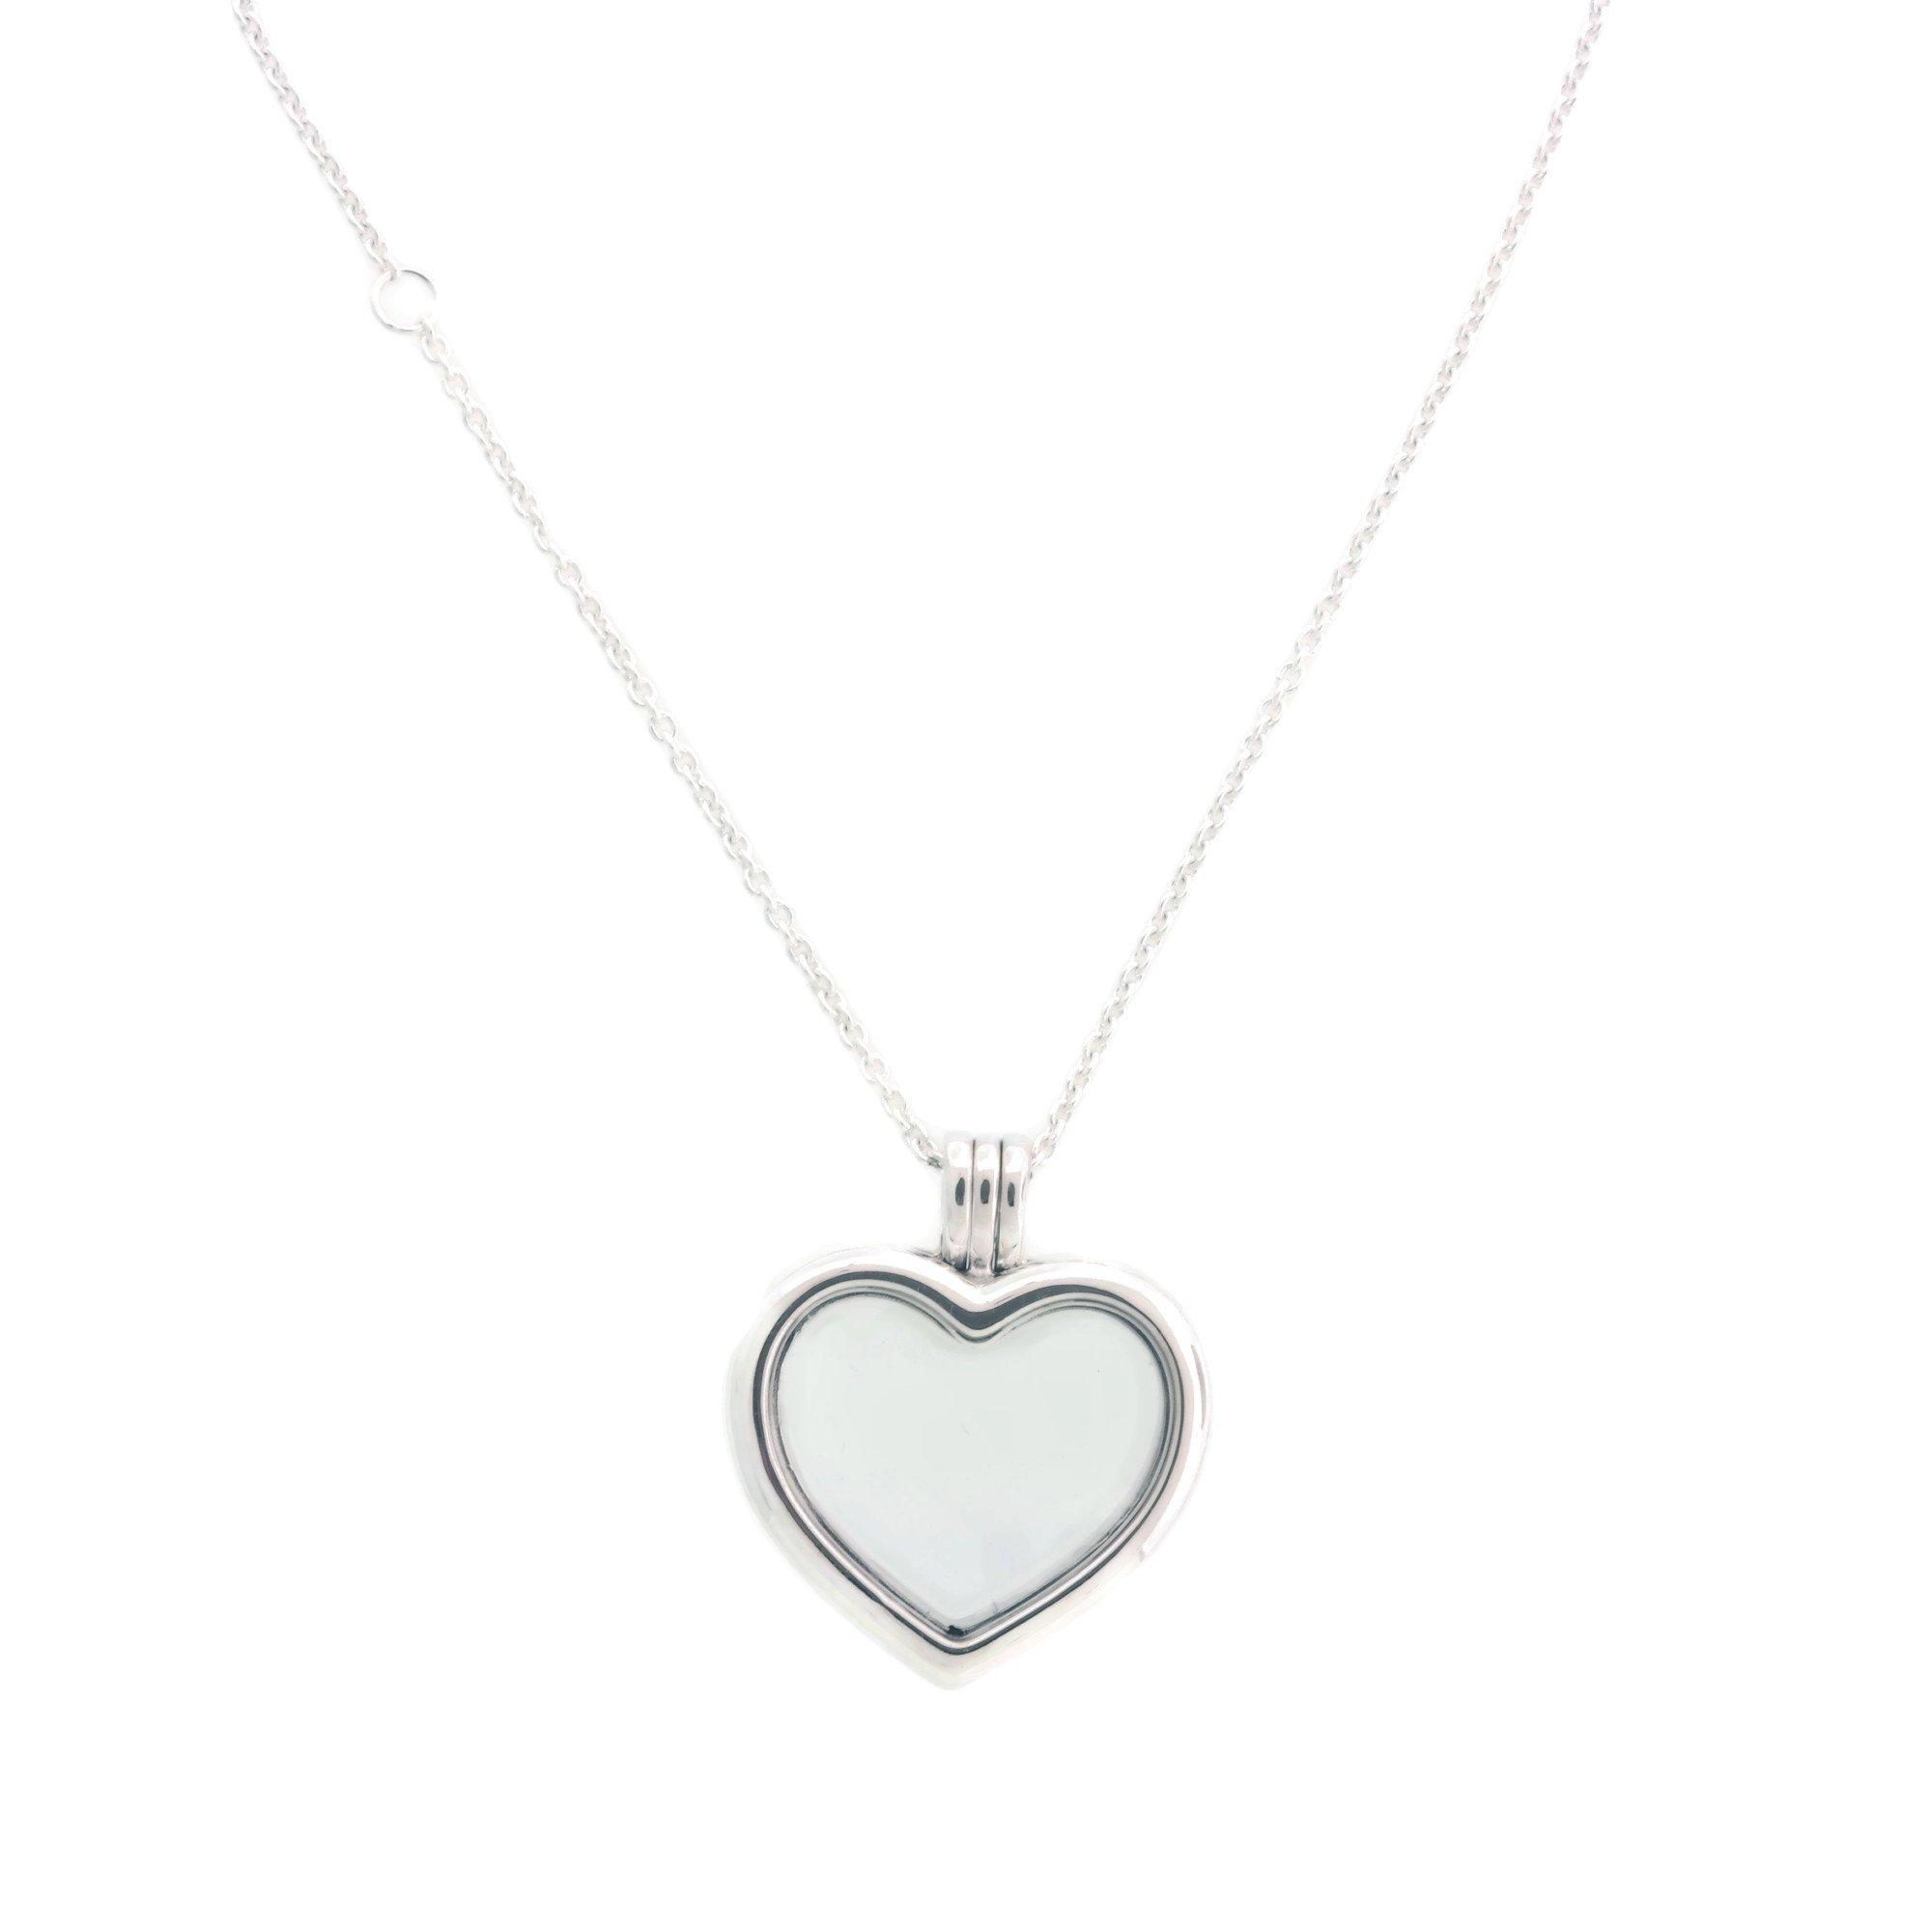 PANDORA Floating Heart Locket, Sapphire Crystal Glass & Clear CZ 590544-60